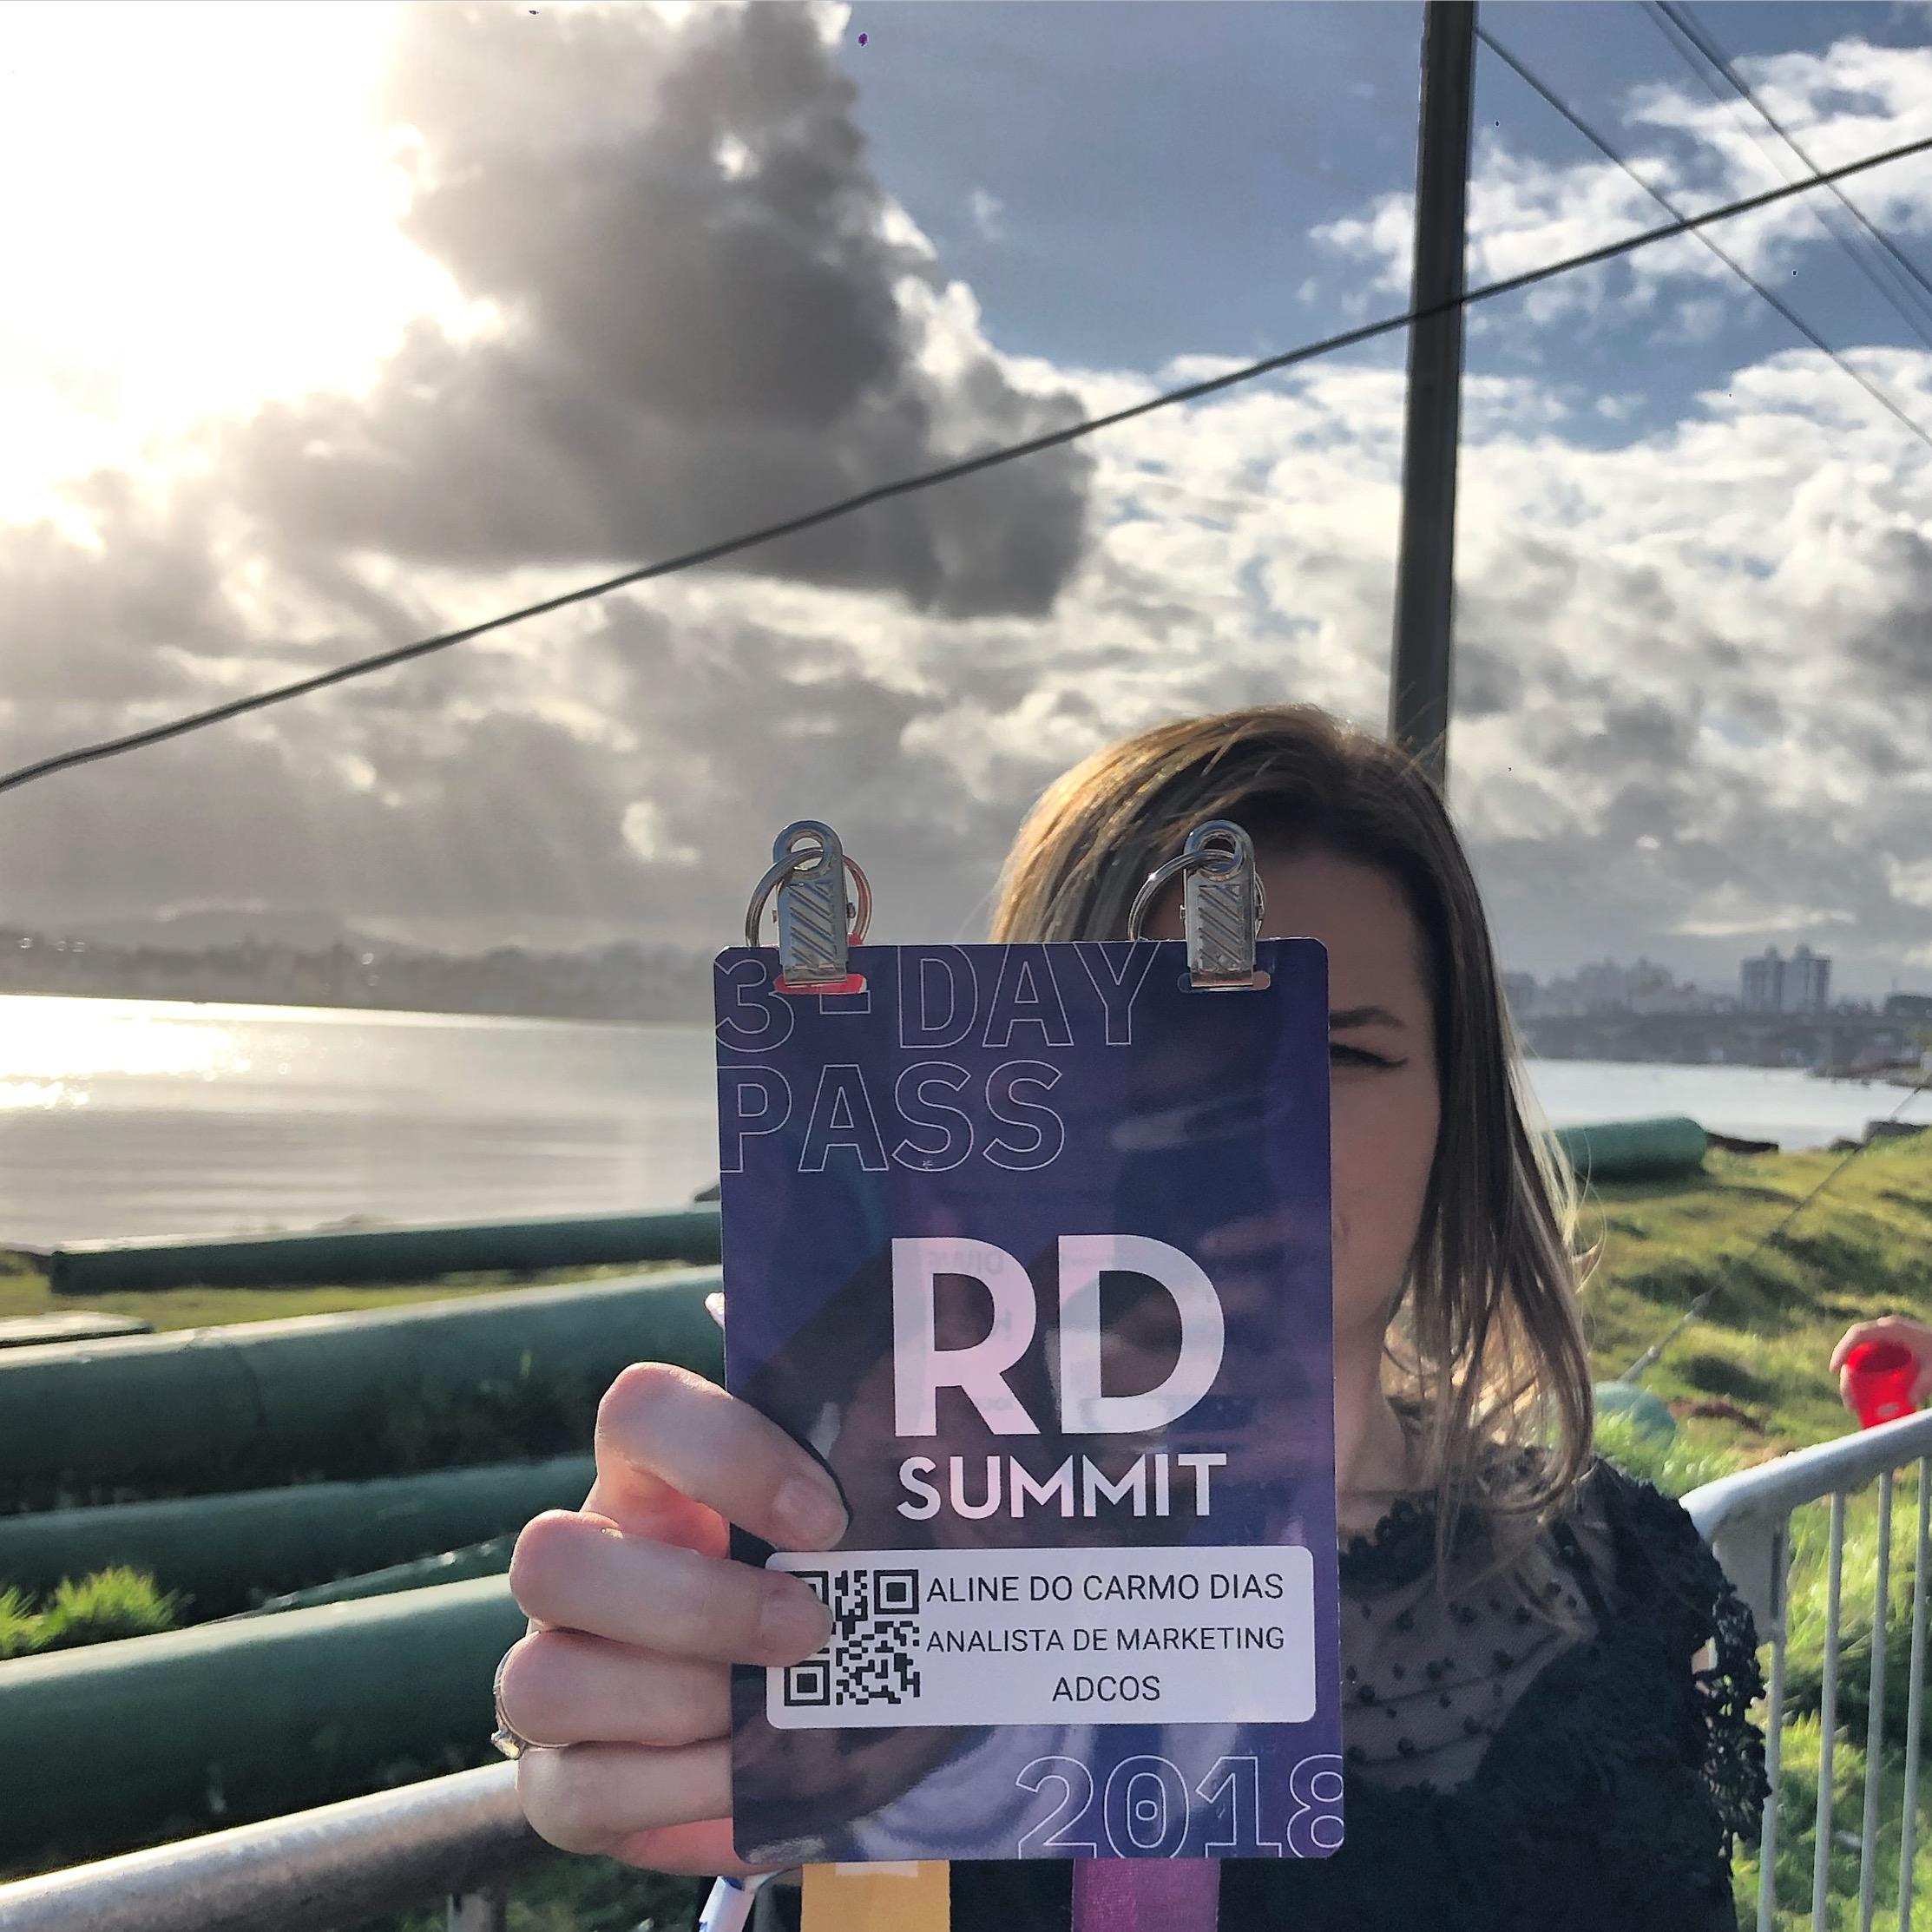 rd summit - florianópolis